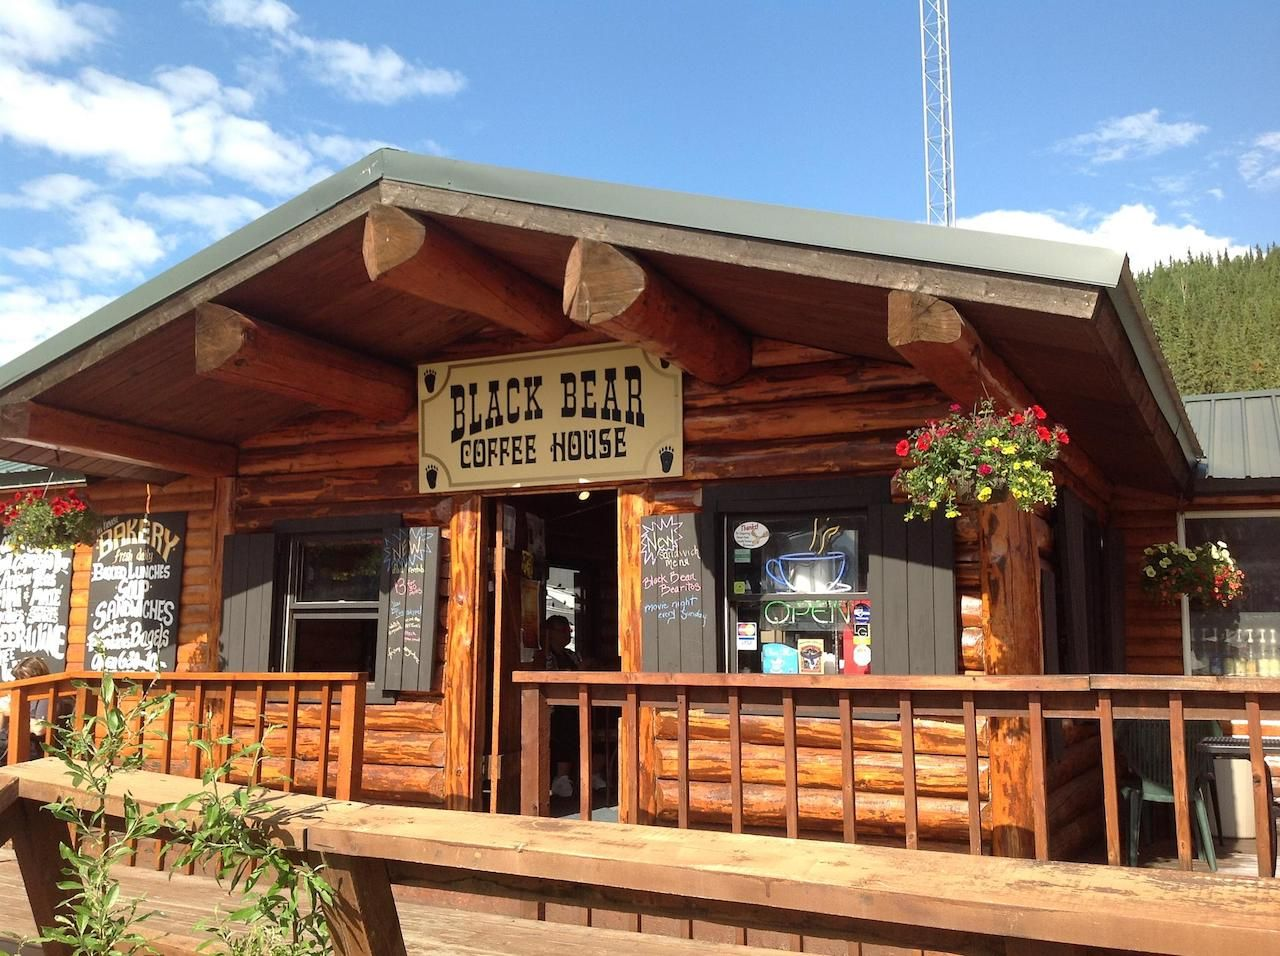 Black Bear Coffee House